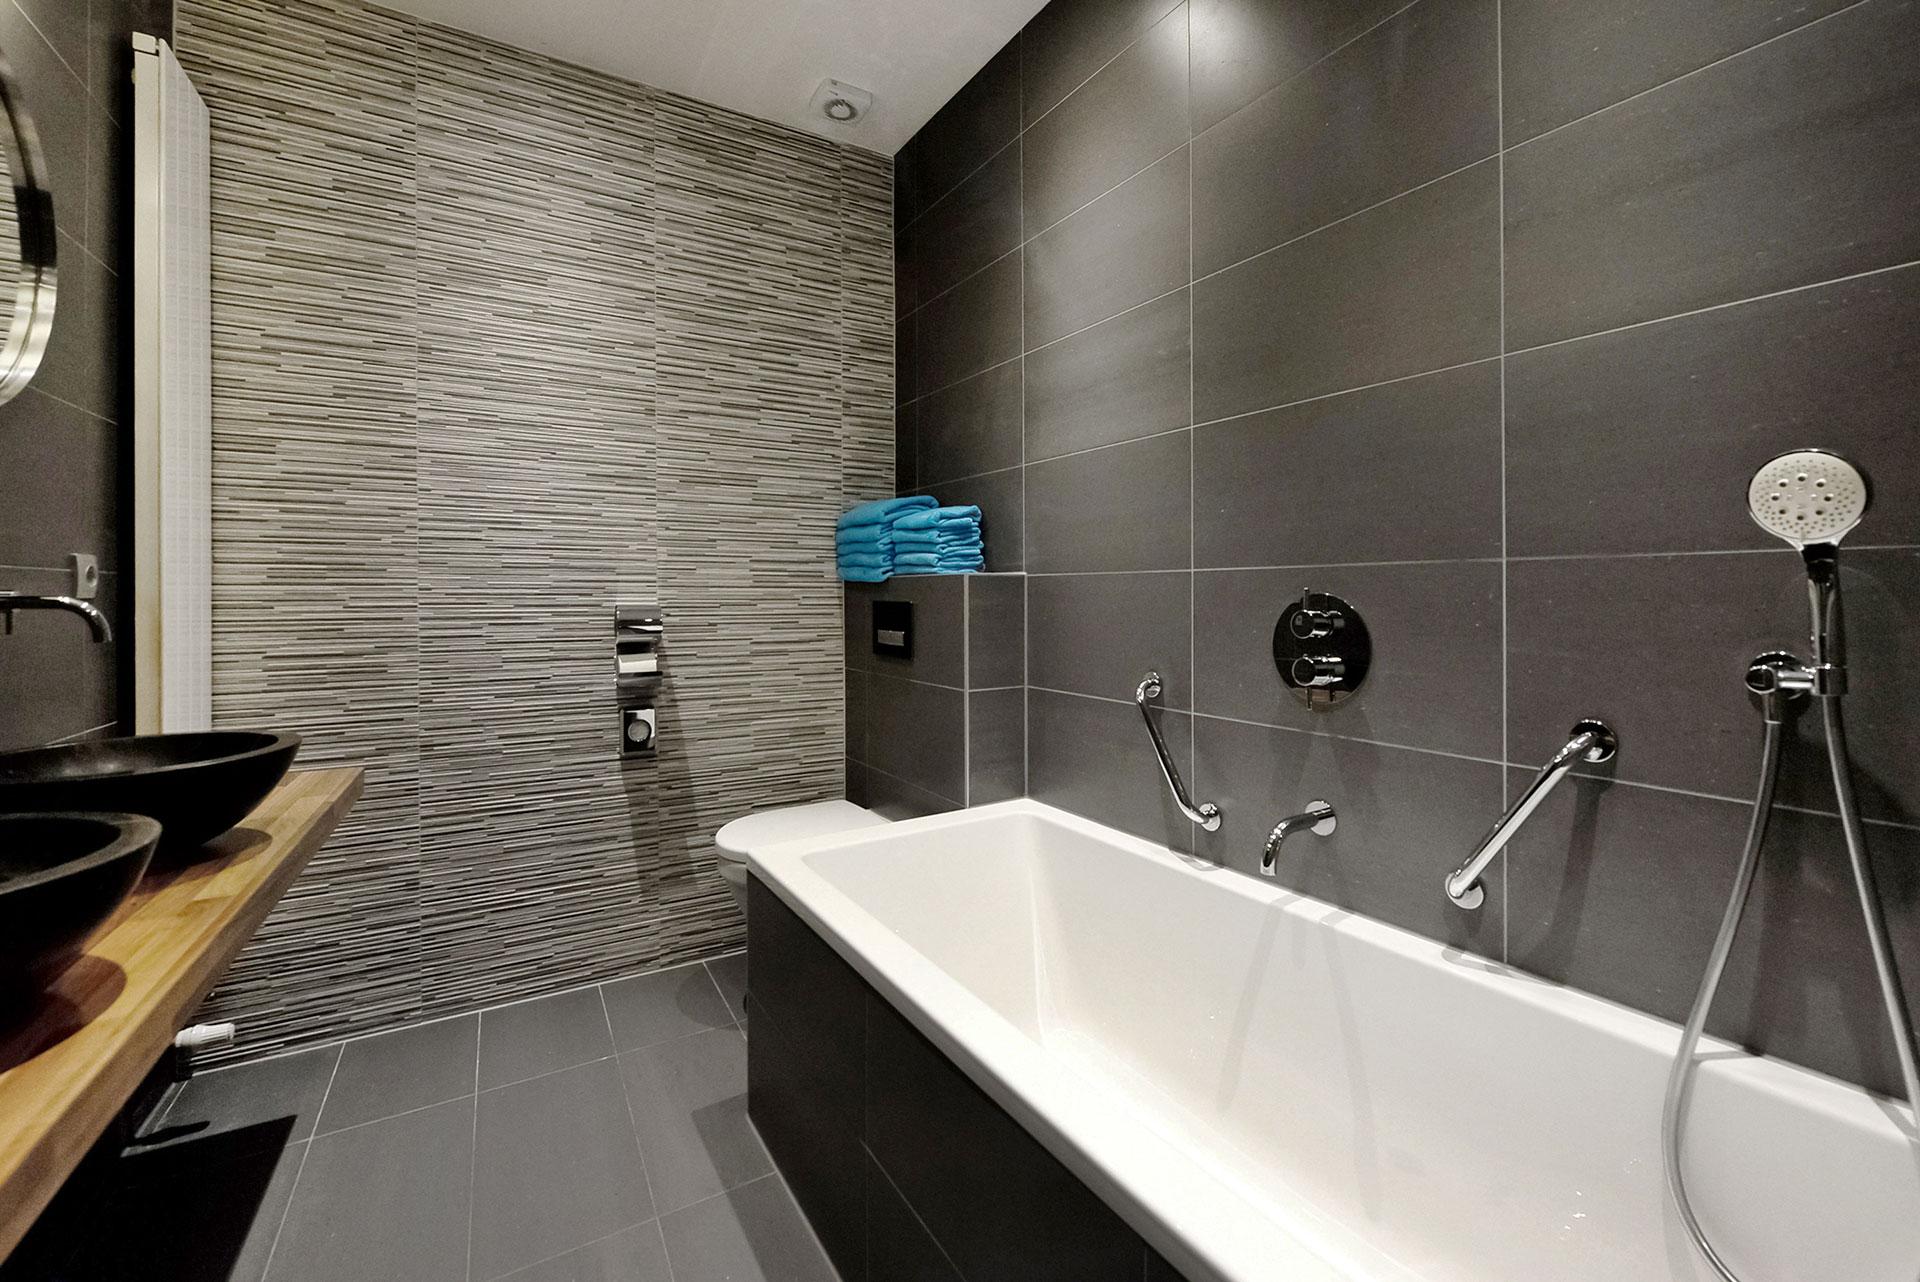 Boomstam blad badkamer badkamermeubel houten blad